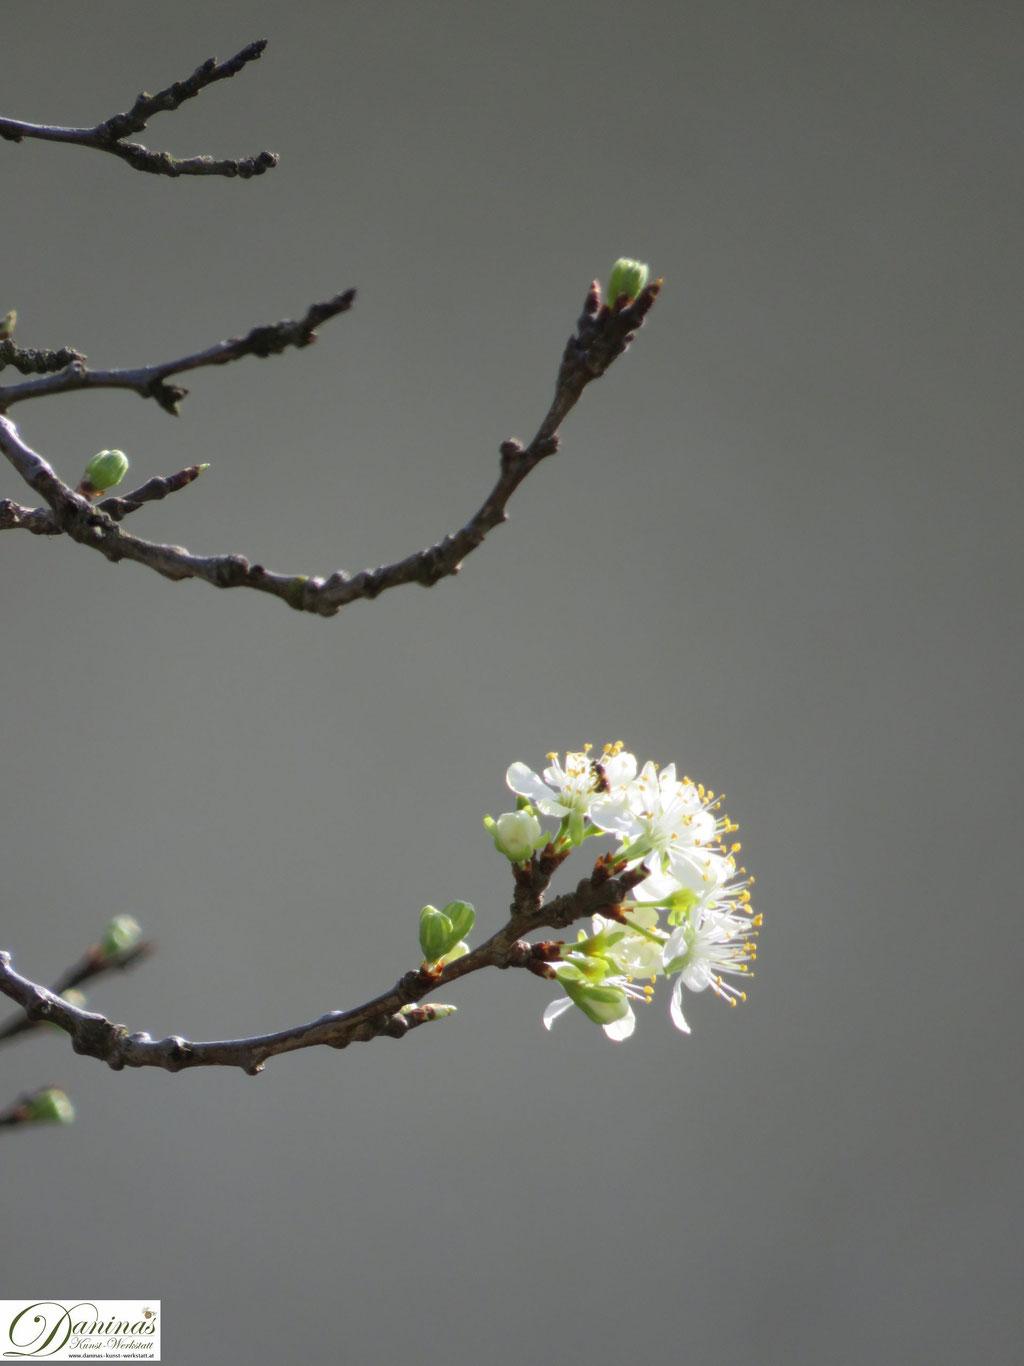 Pflaumenbaum (Zwetschkenbaum) - erste Blüten im Frühling